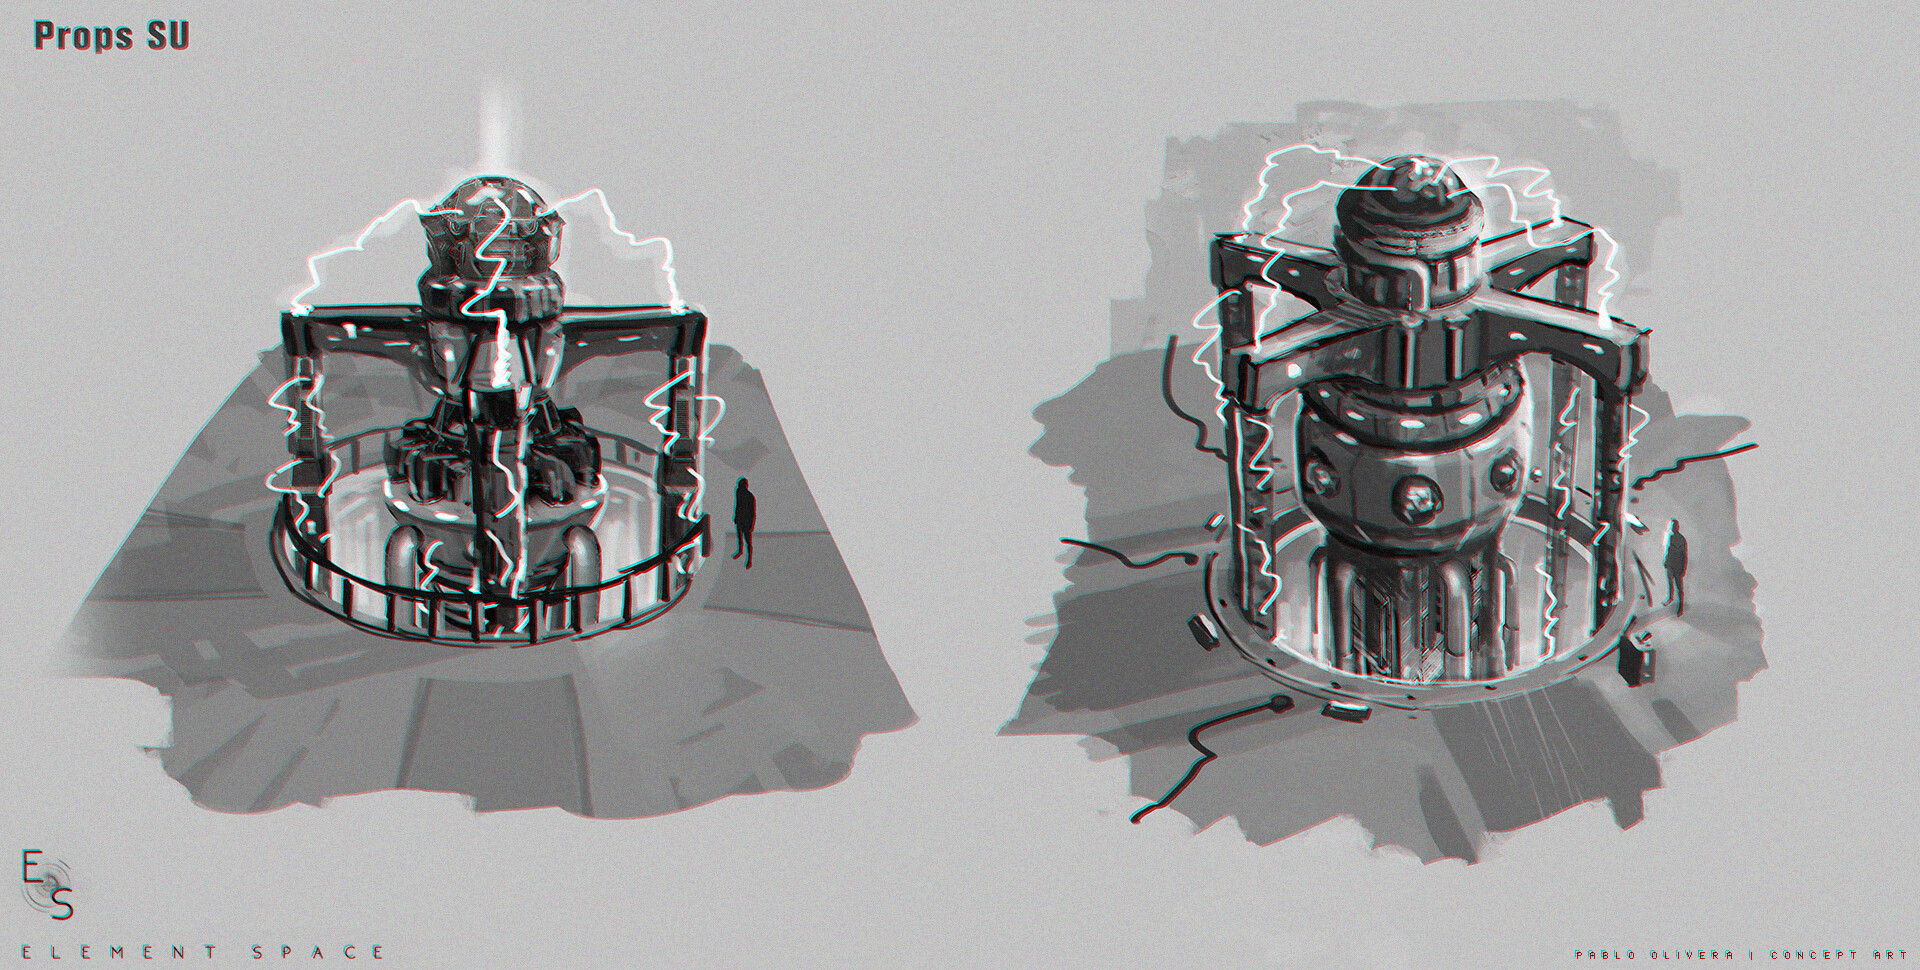 Pablo olivera element space props su reactor final